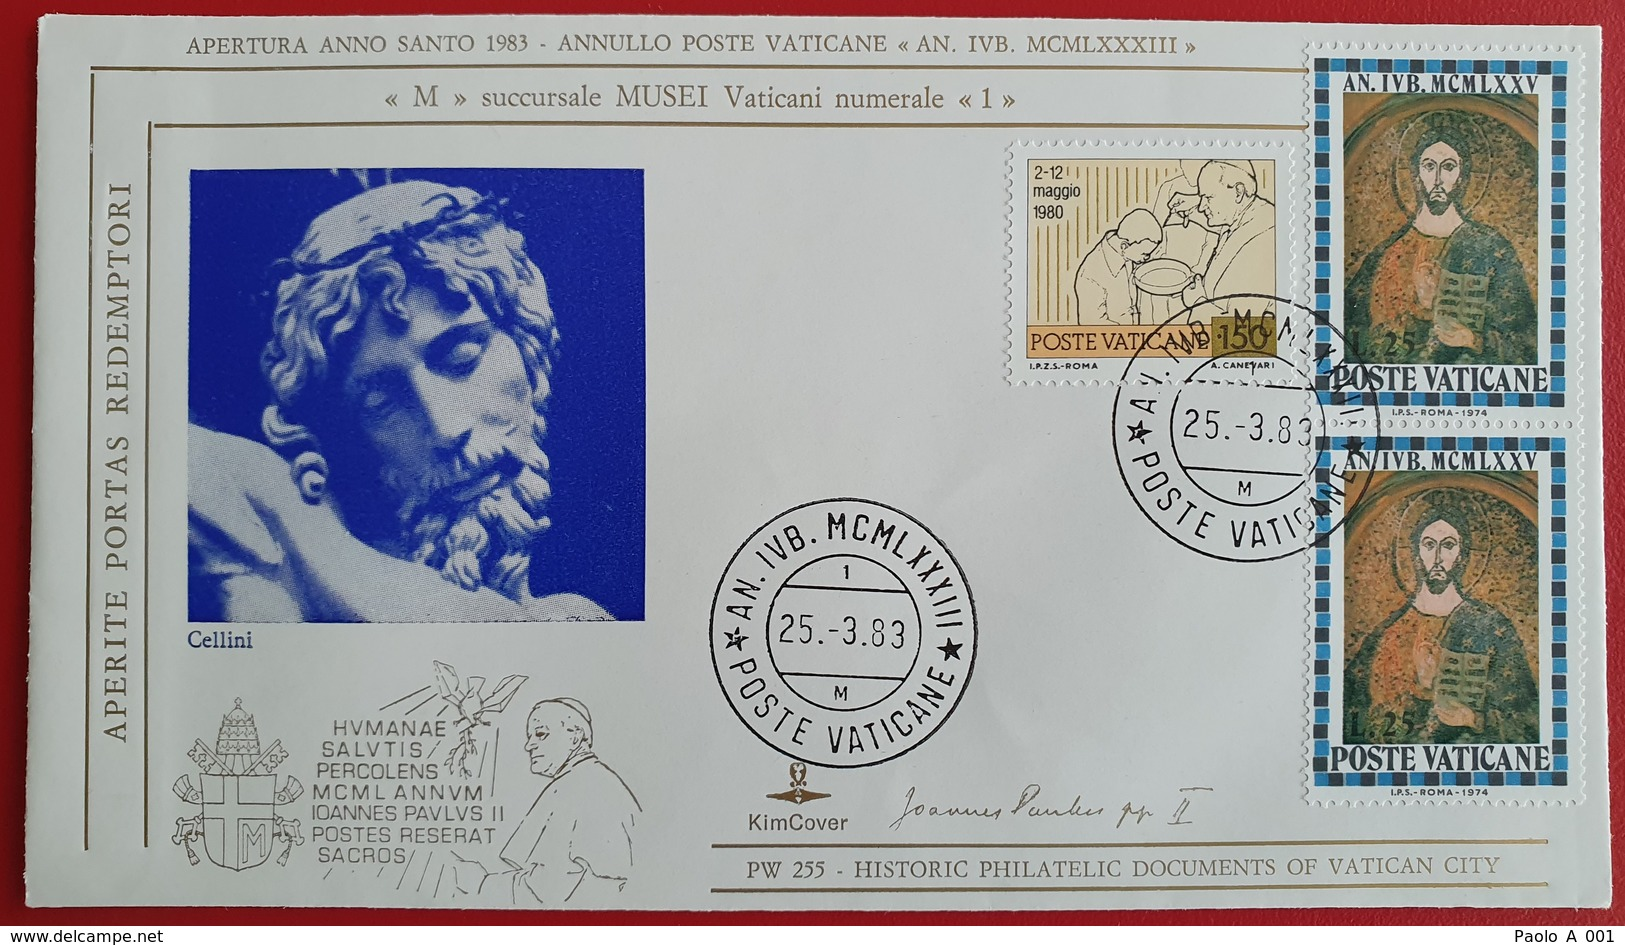 VATICANO VATIKAN VATICAN M Musei Vaticani Numerale 1 Aperite Portas Redemptori Apertura Anno Santo 1983 - Vaticano